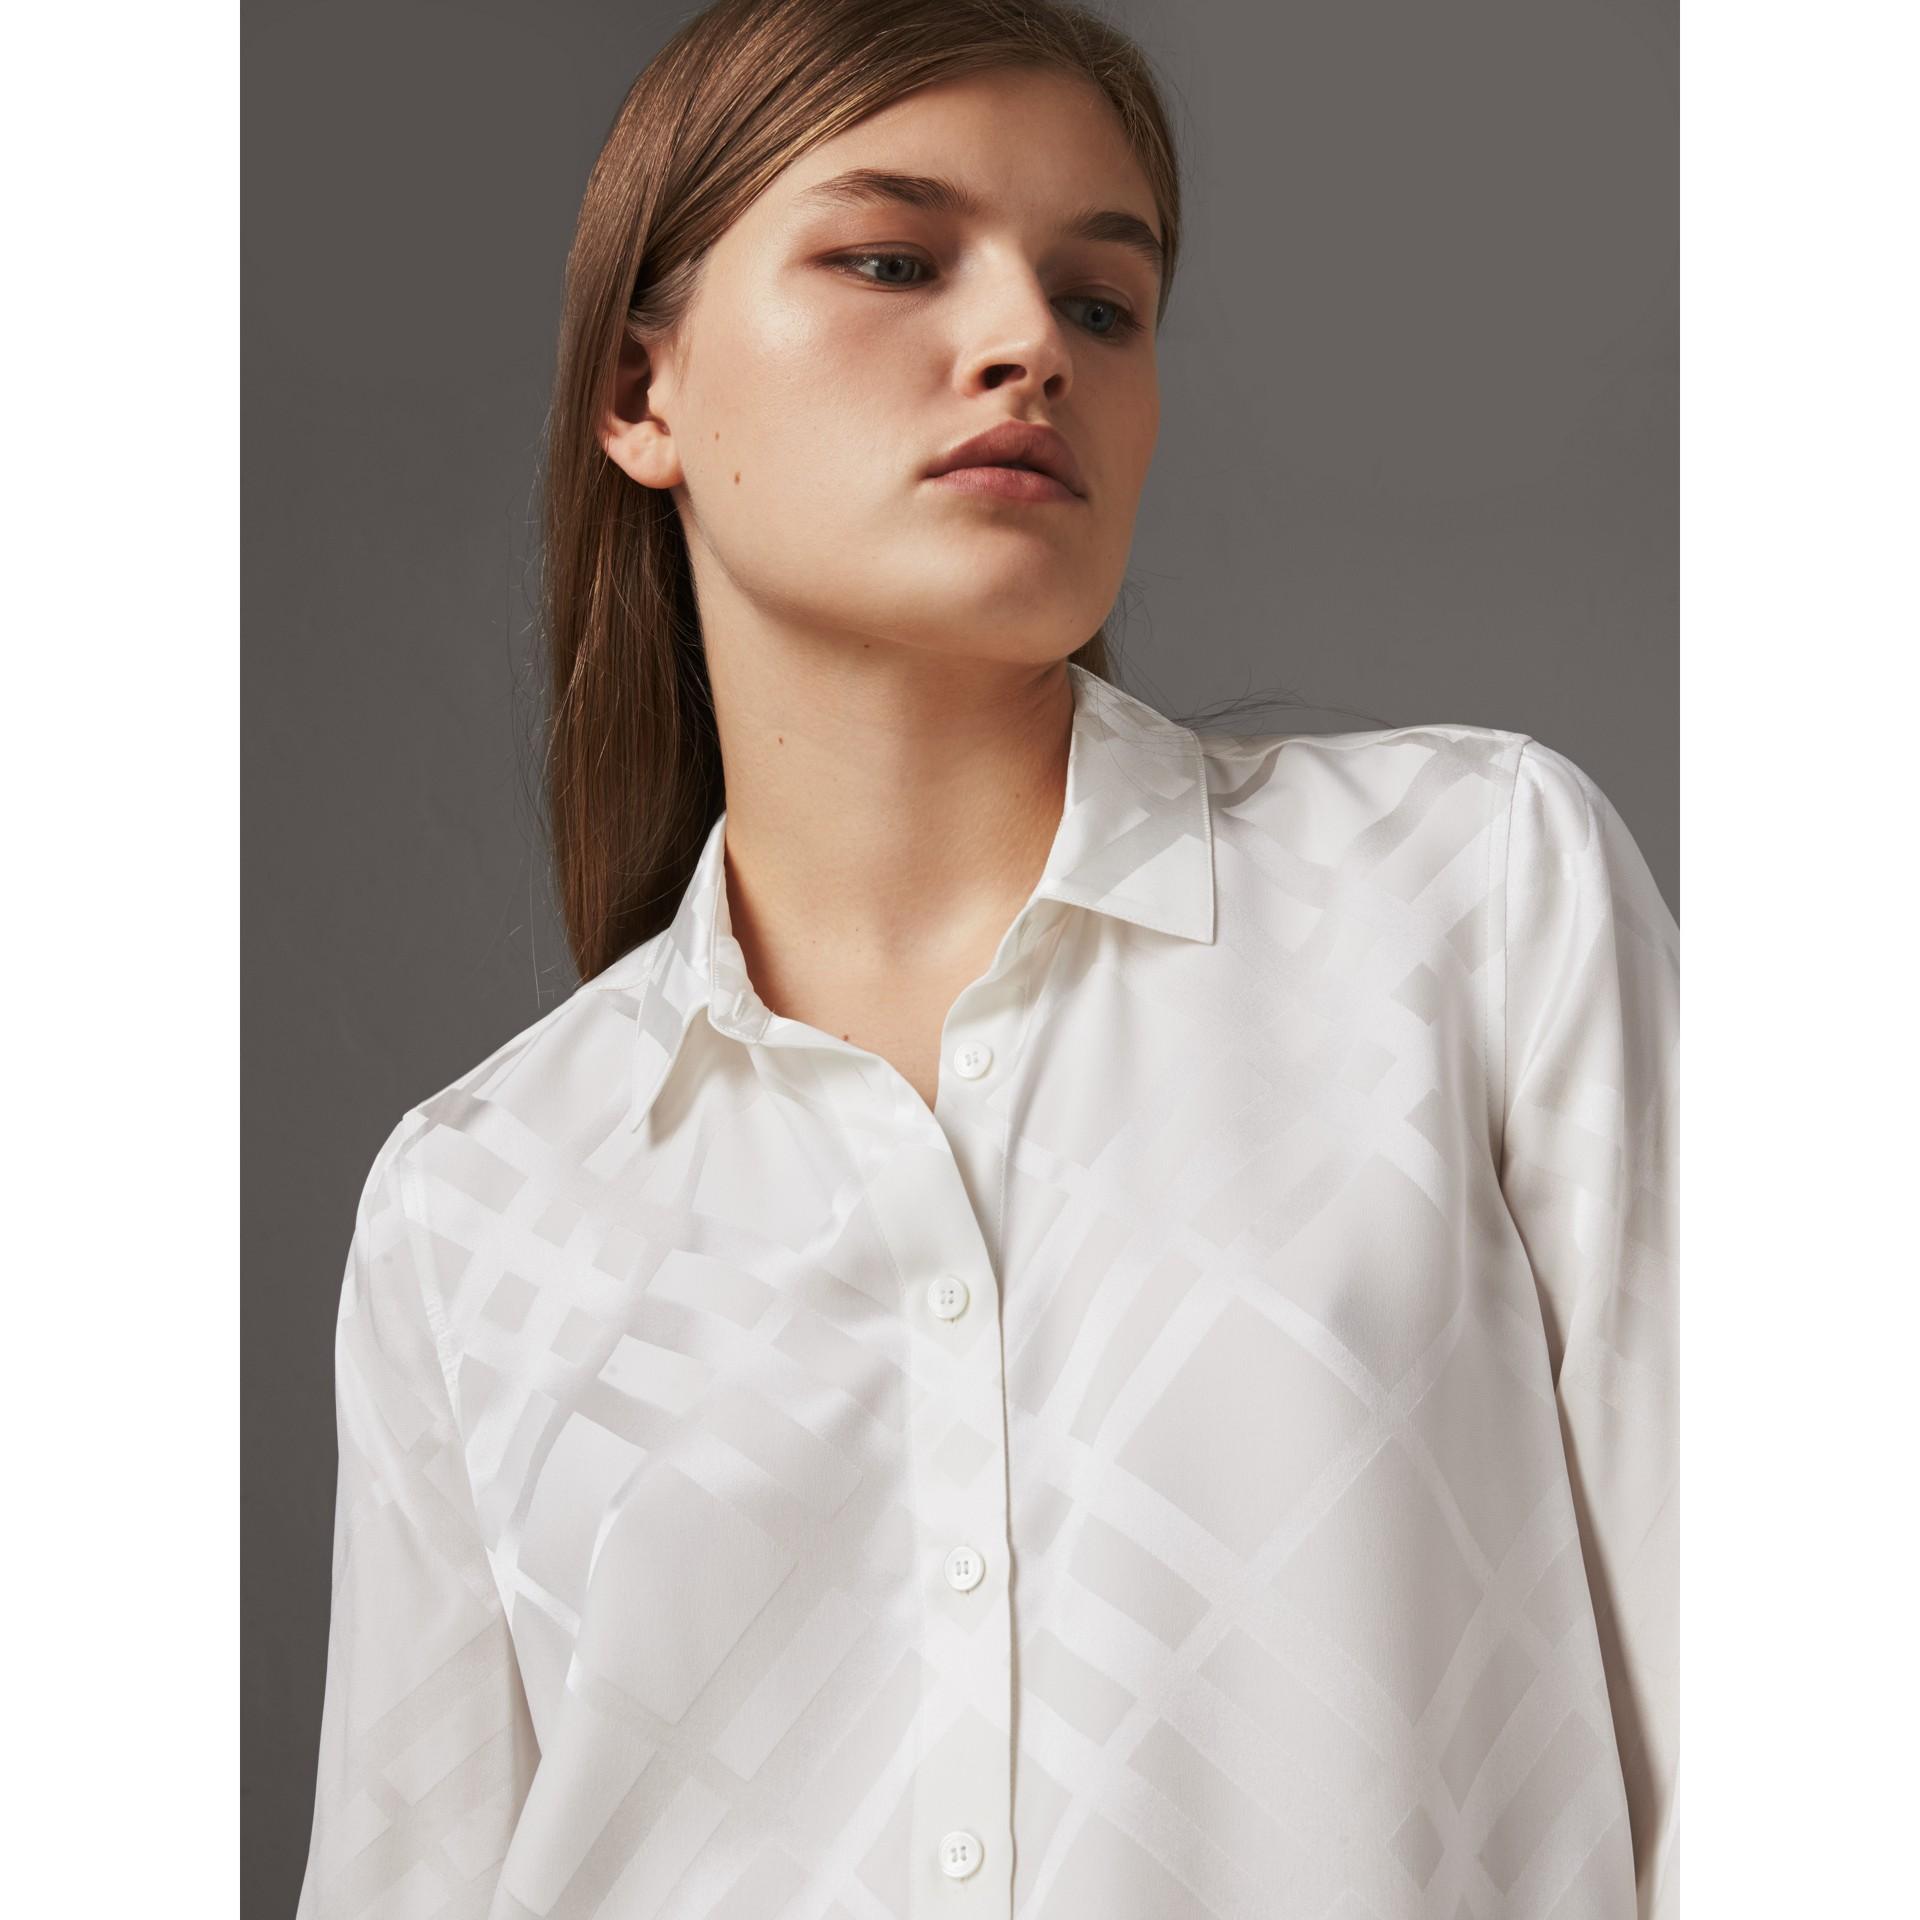 Tonal Check Silk Shirt in White - Women | Burberry Canada - gallery image 2